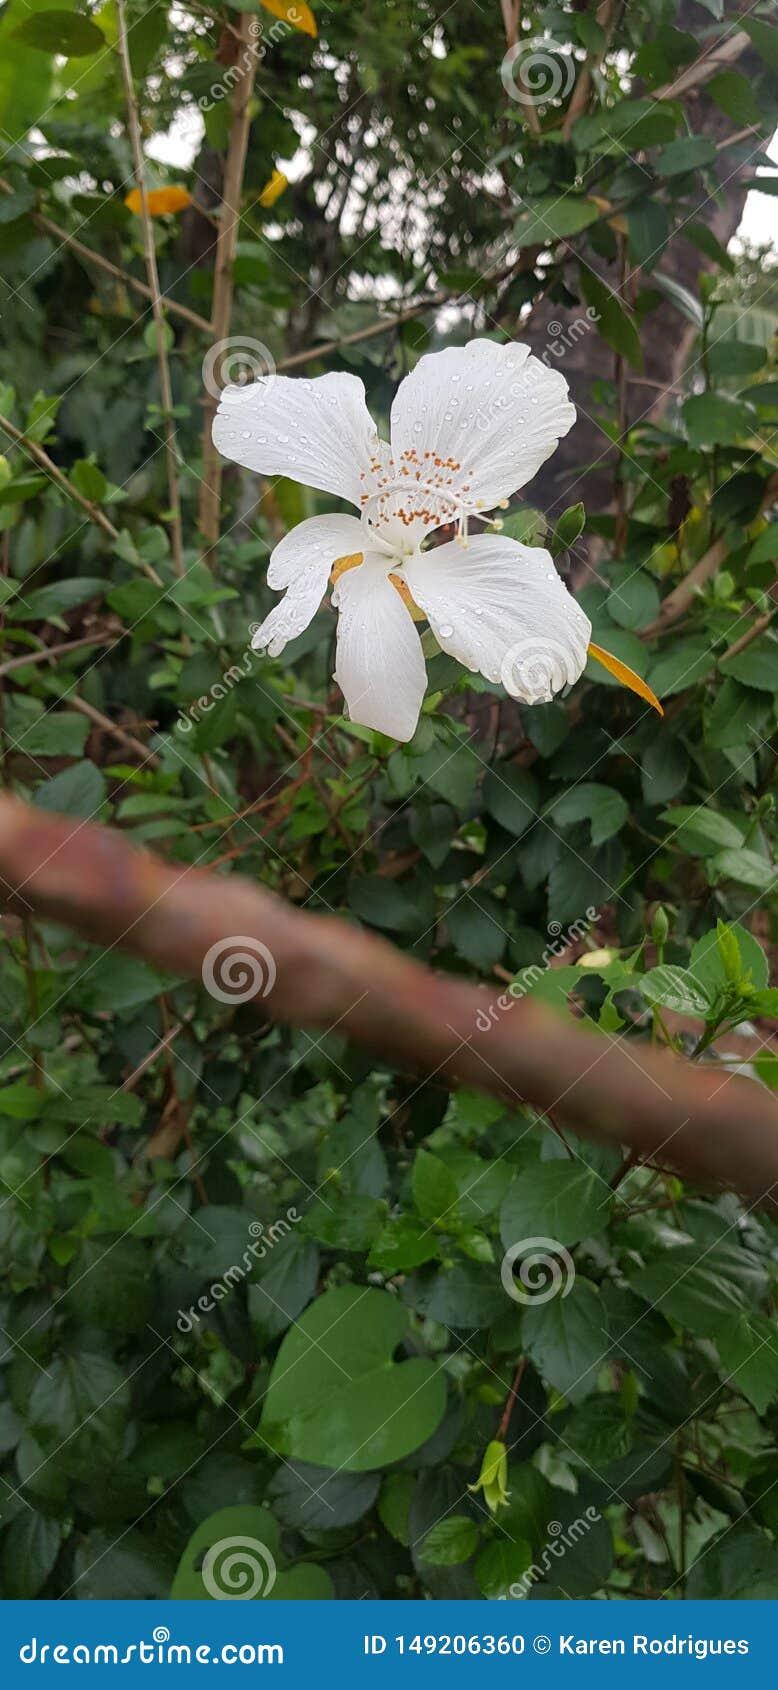 Blommar taggar